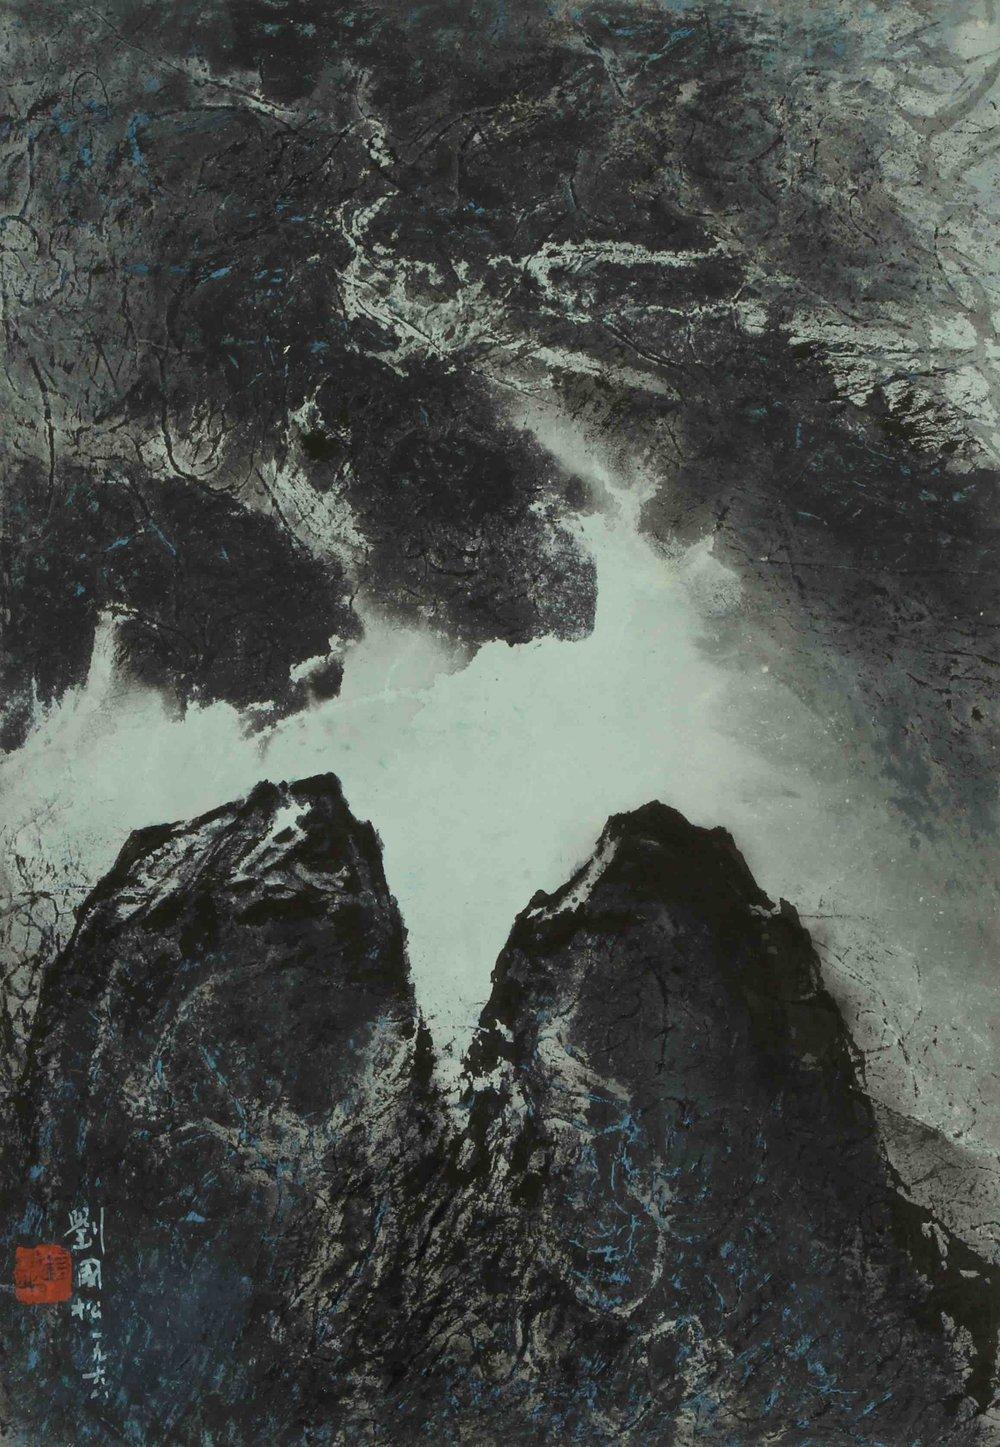 劉國松 LIU Kuo-Sung〈山崗之晨 Morning of the Hills〉